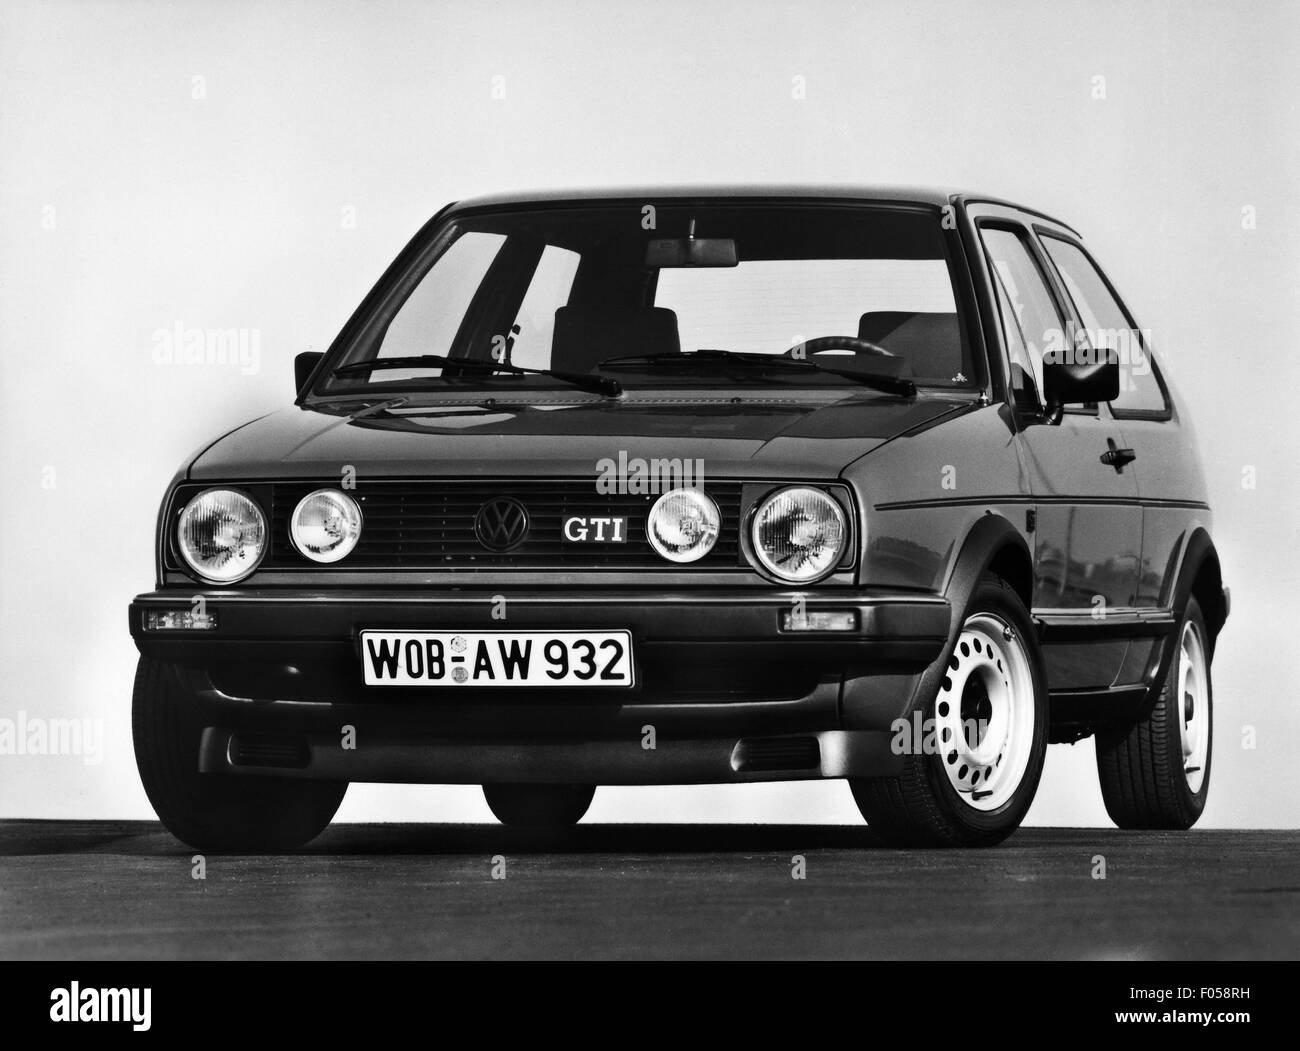 transport / transportation, car, vehicle variants, Volkswagen, VW Golf Mk2 GTI, 1980s, Additional-Rights-Clearences - Stock Image